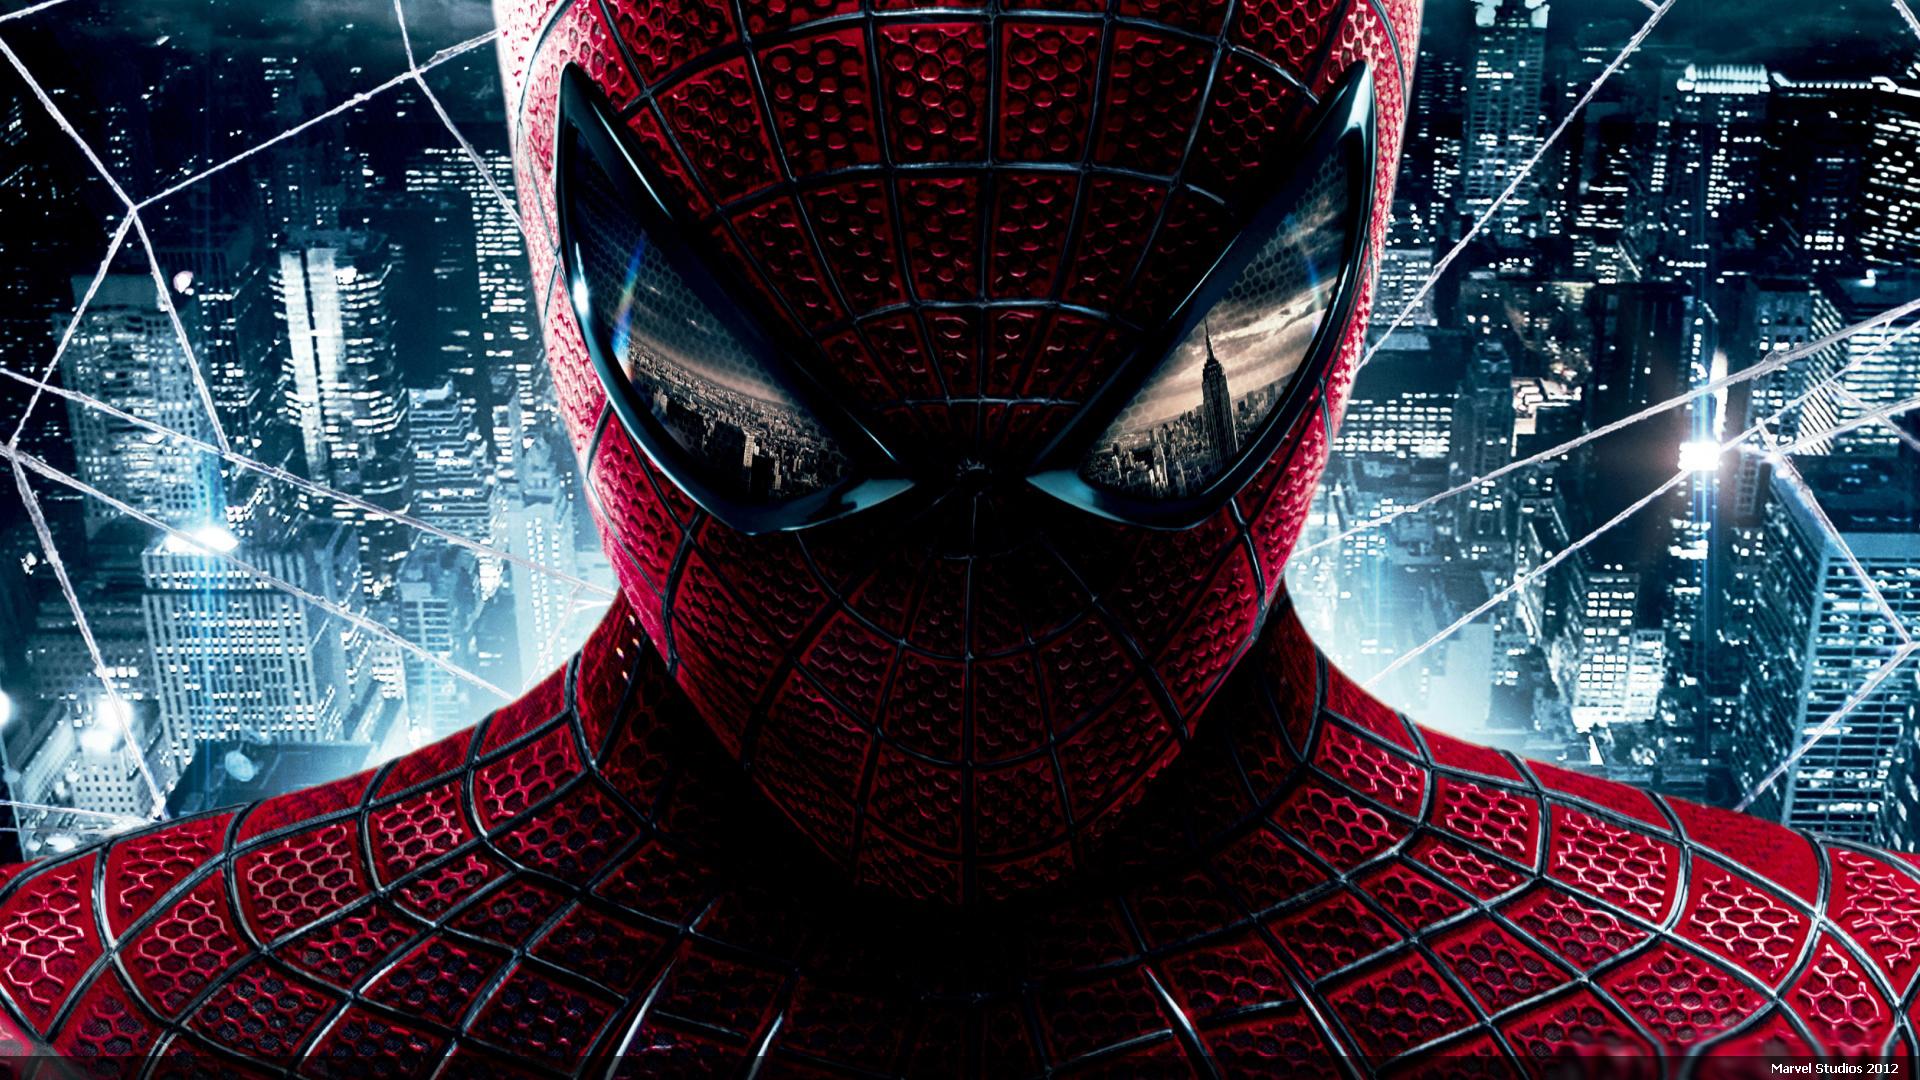 Spiderman Full Hd Wallpapers Full HD Wallpapers download 1080p 1920x1080